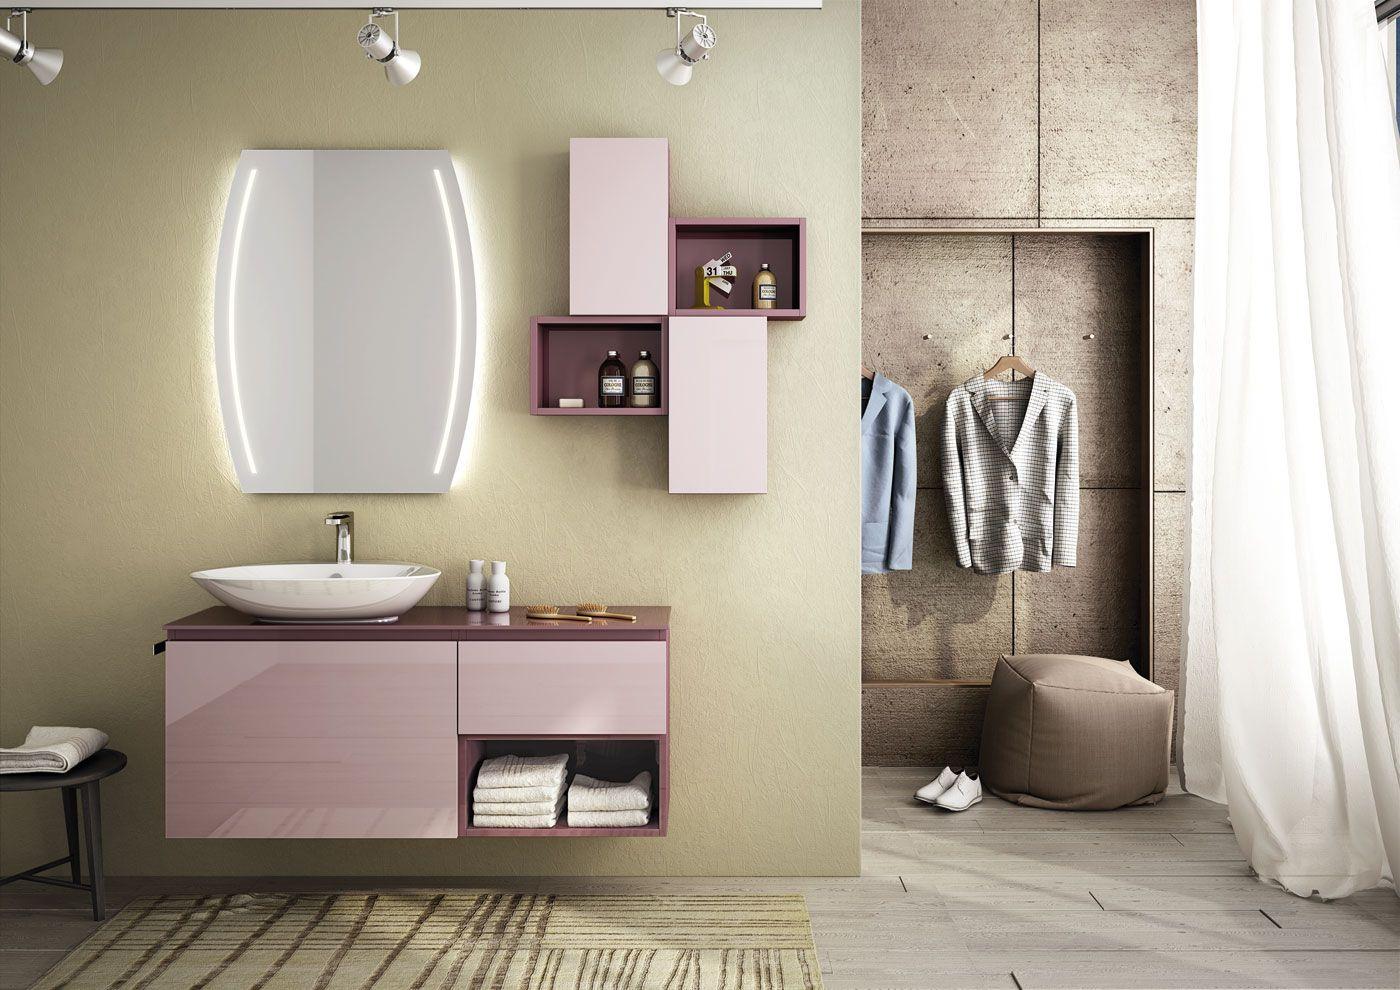 Mobile lavabo componibile singolo sospeso freedom 11 by - Mobili lavabo sospesi ...